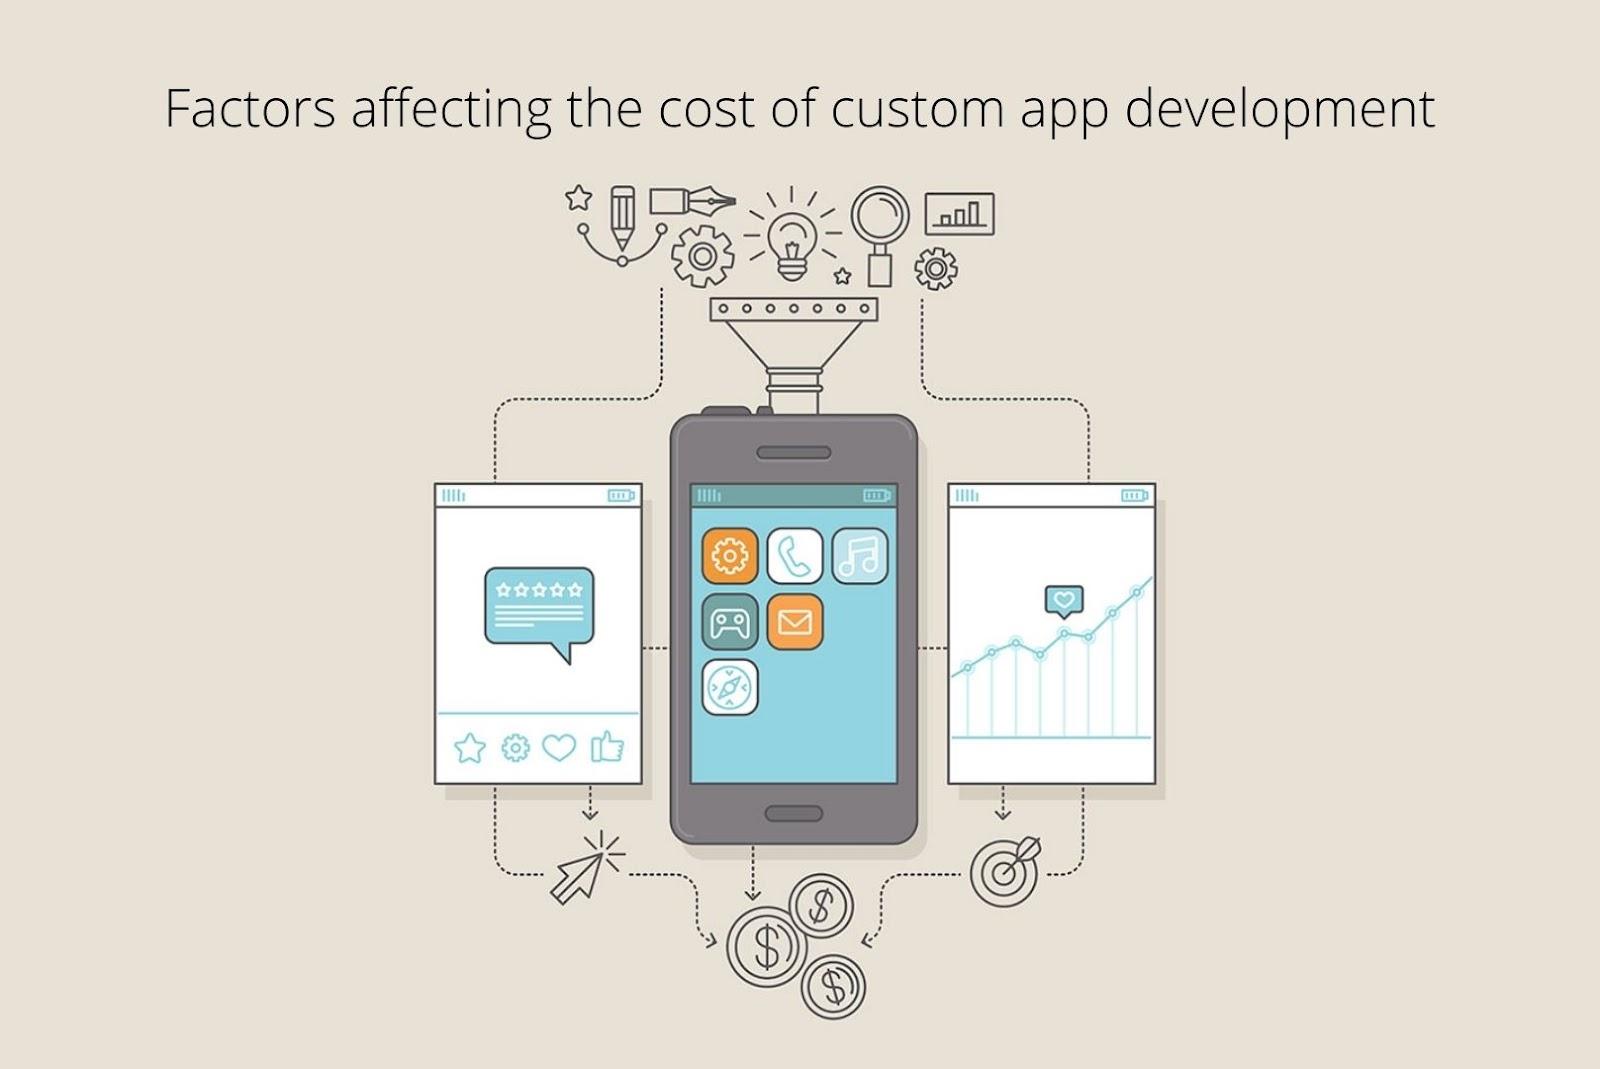 Factors affecting the cost of custom app development